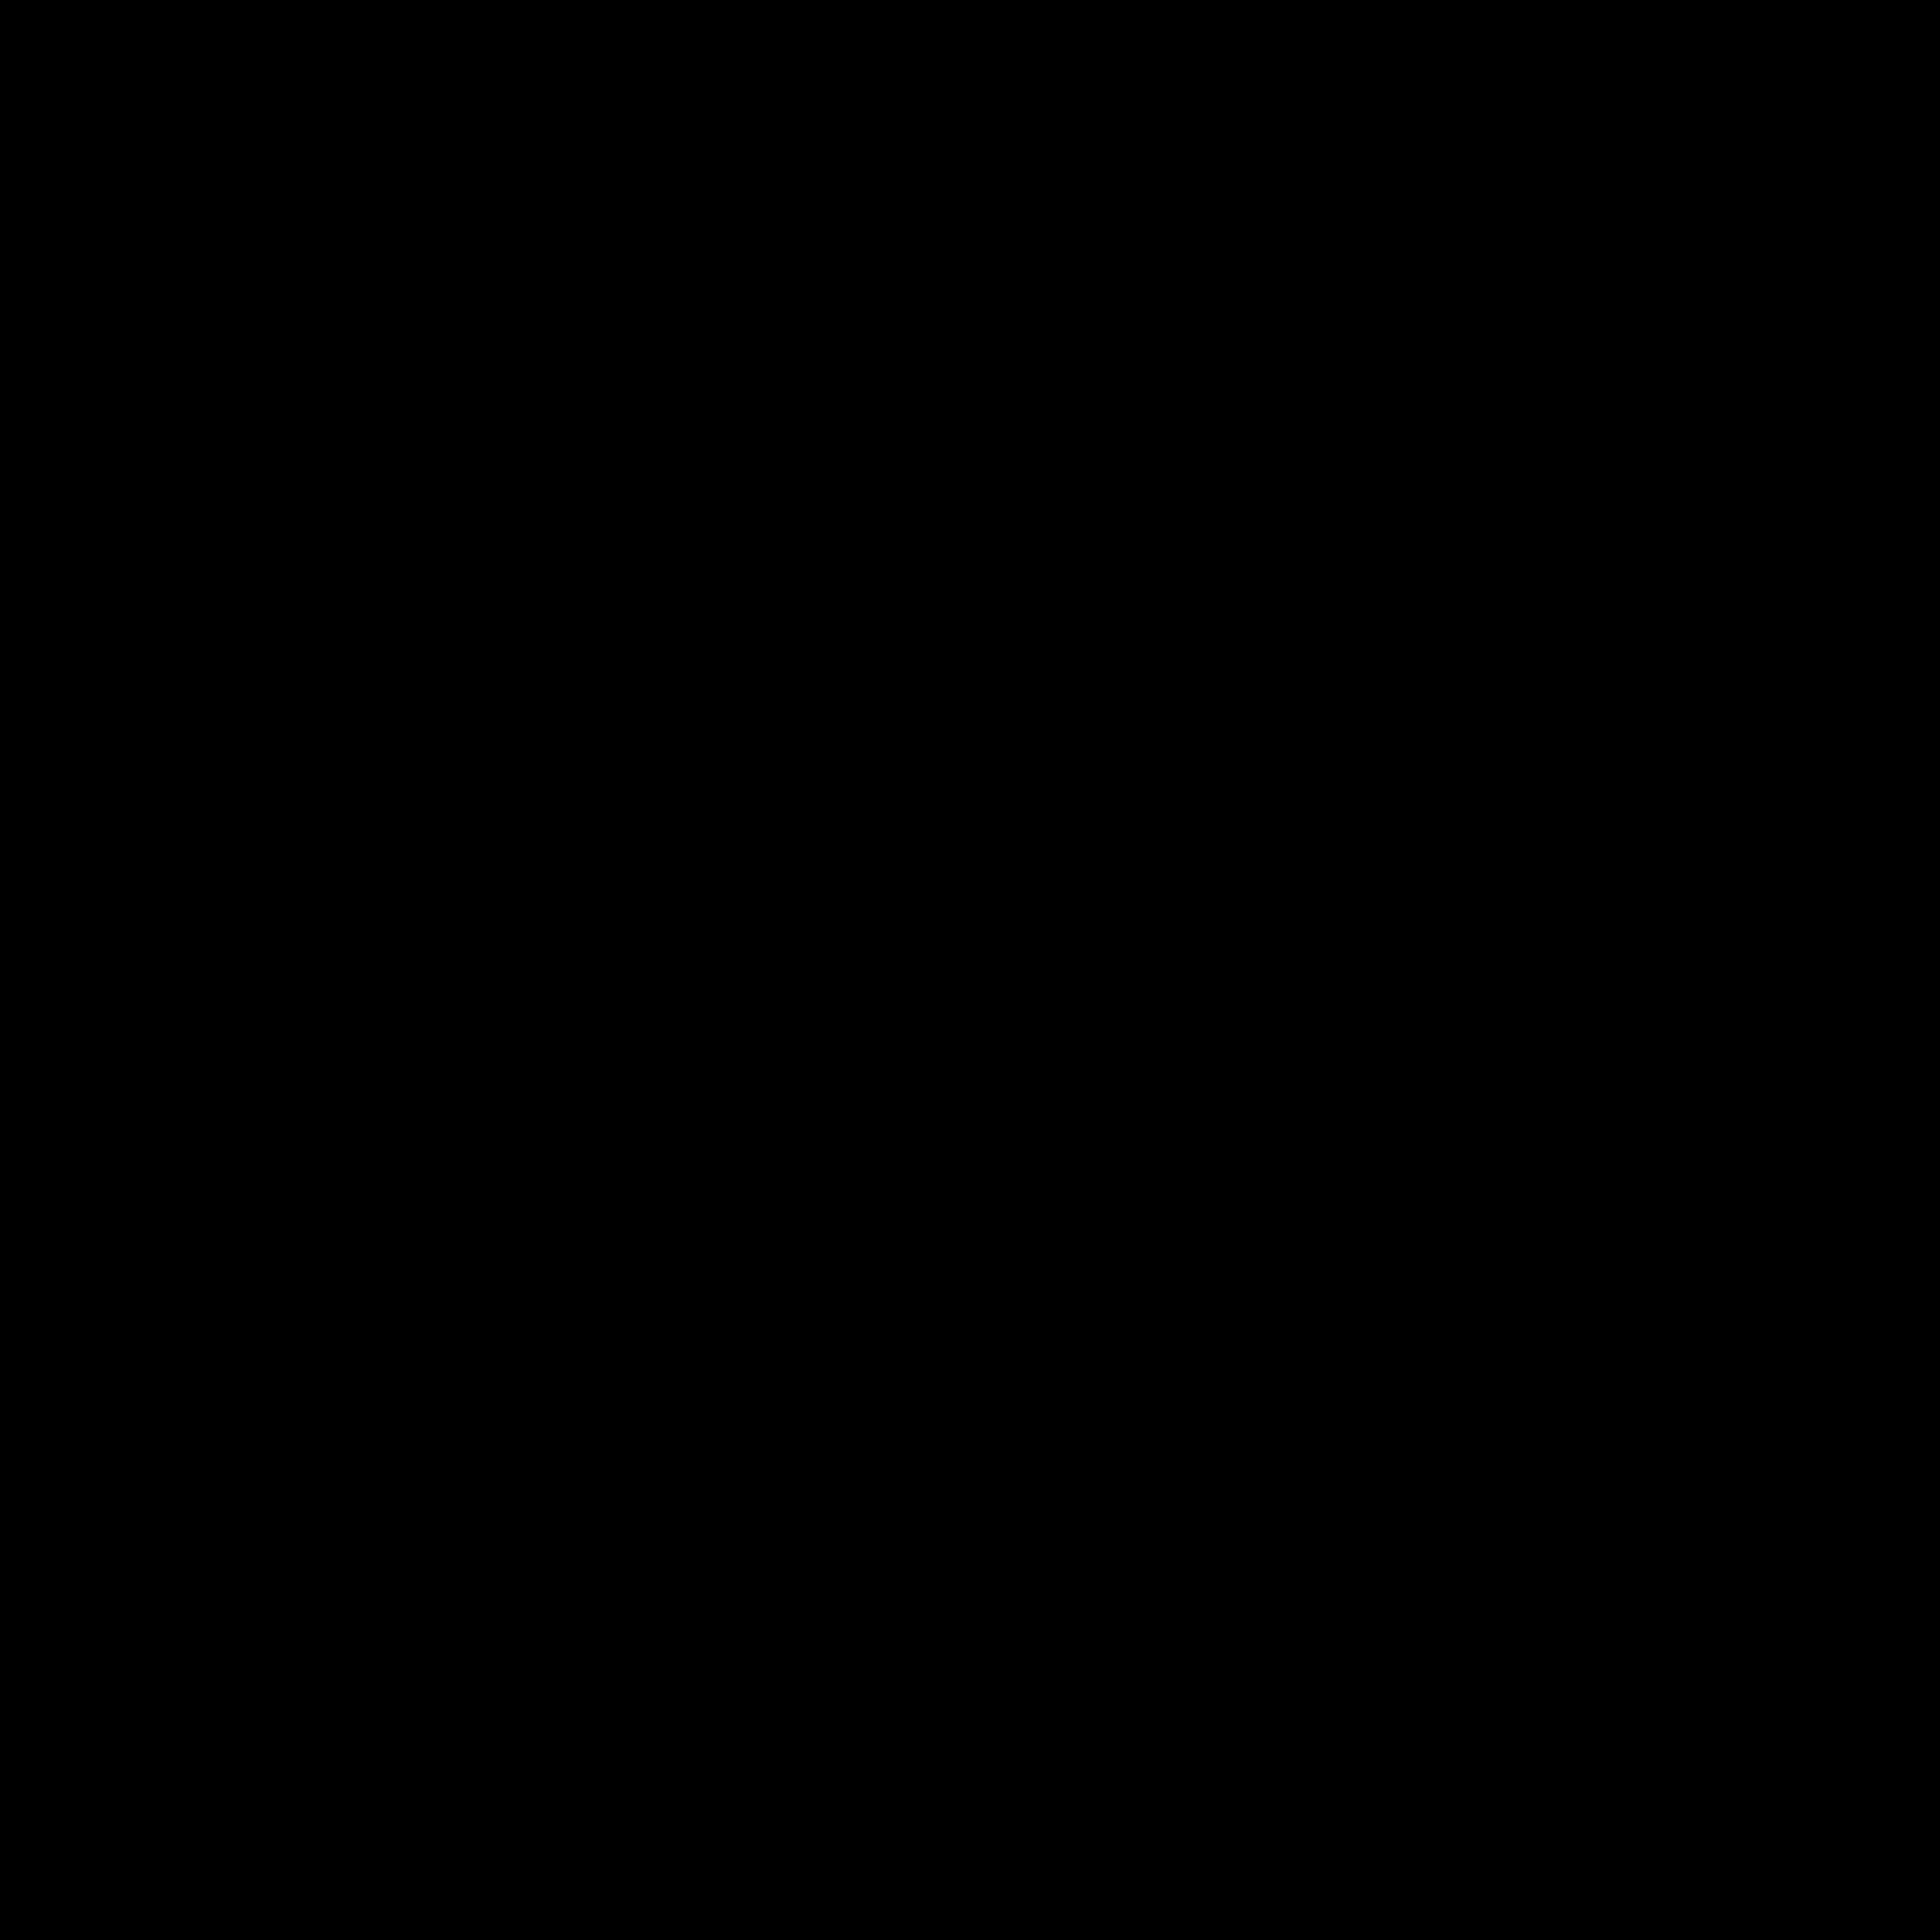 novartis-logo-png-transparent.png